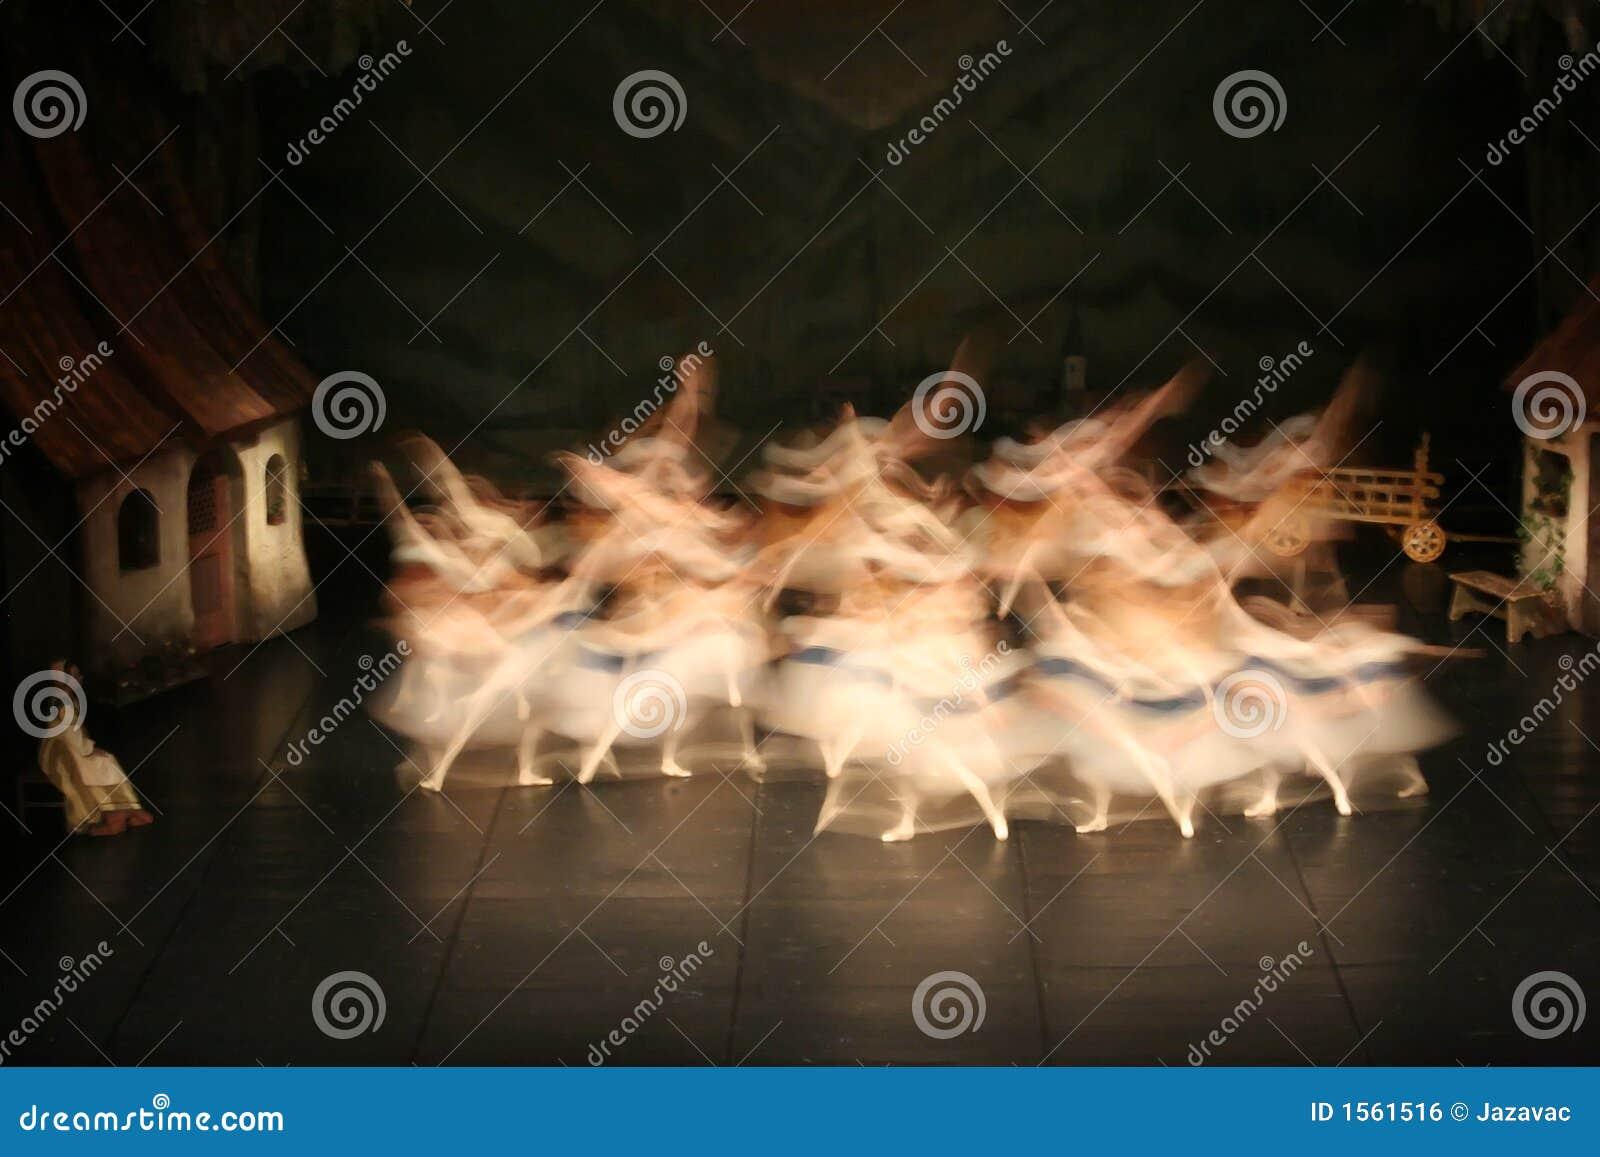 Danseurs de ballet